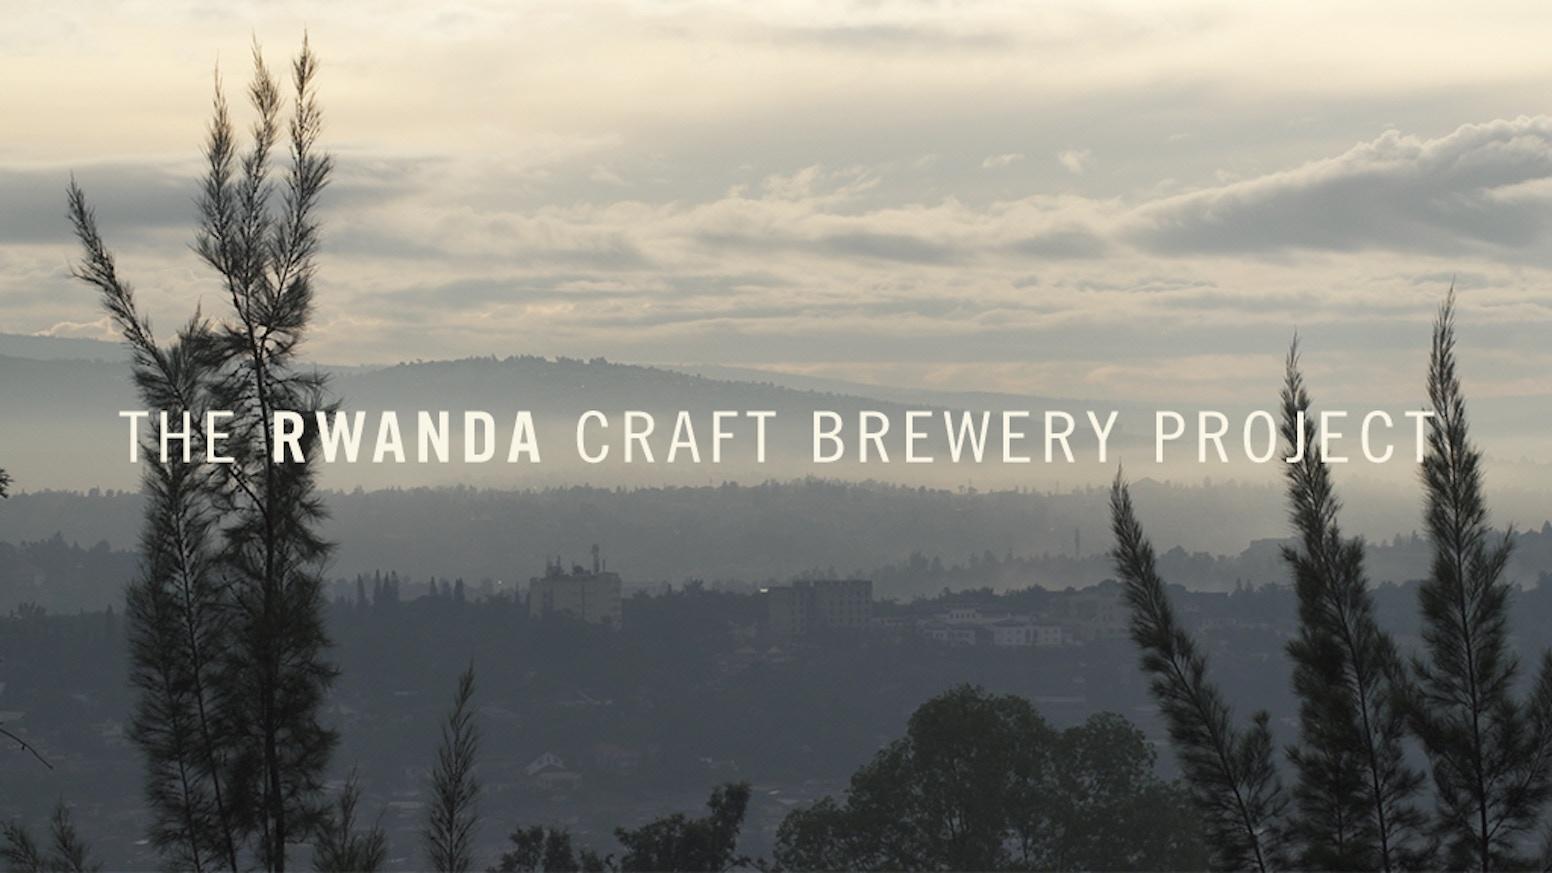 Rwanda Craft Brewery Project